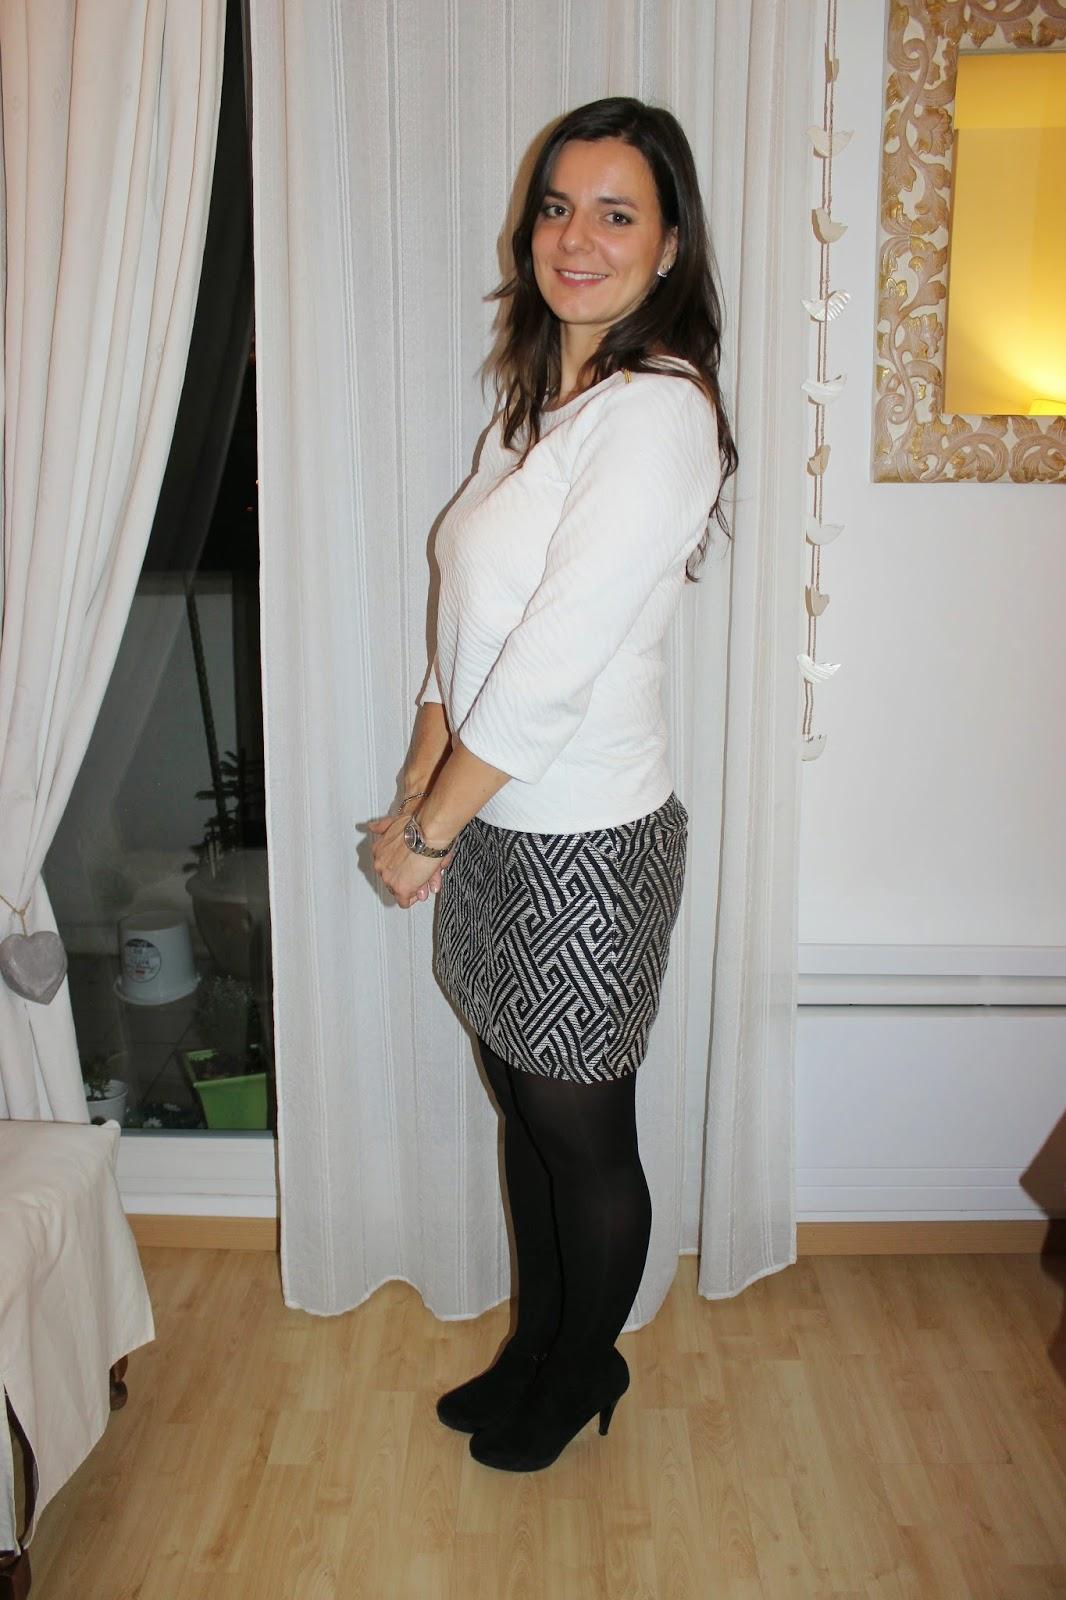 low boots naf naf, jupe grace and mila, top naf naf, Boucle d'oreilles Zara